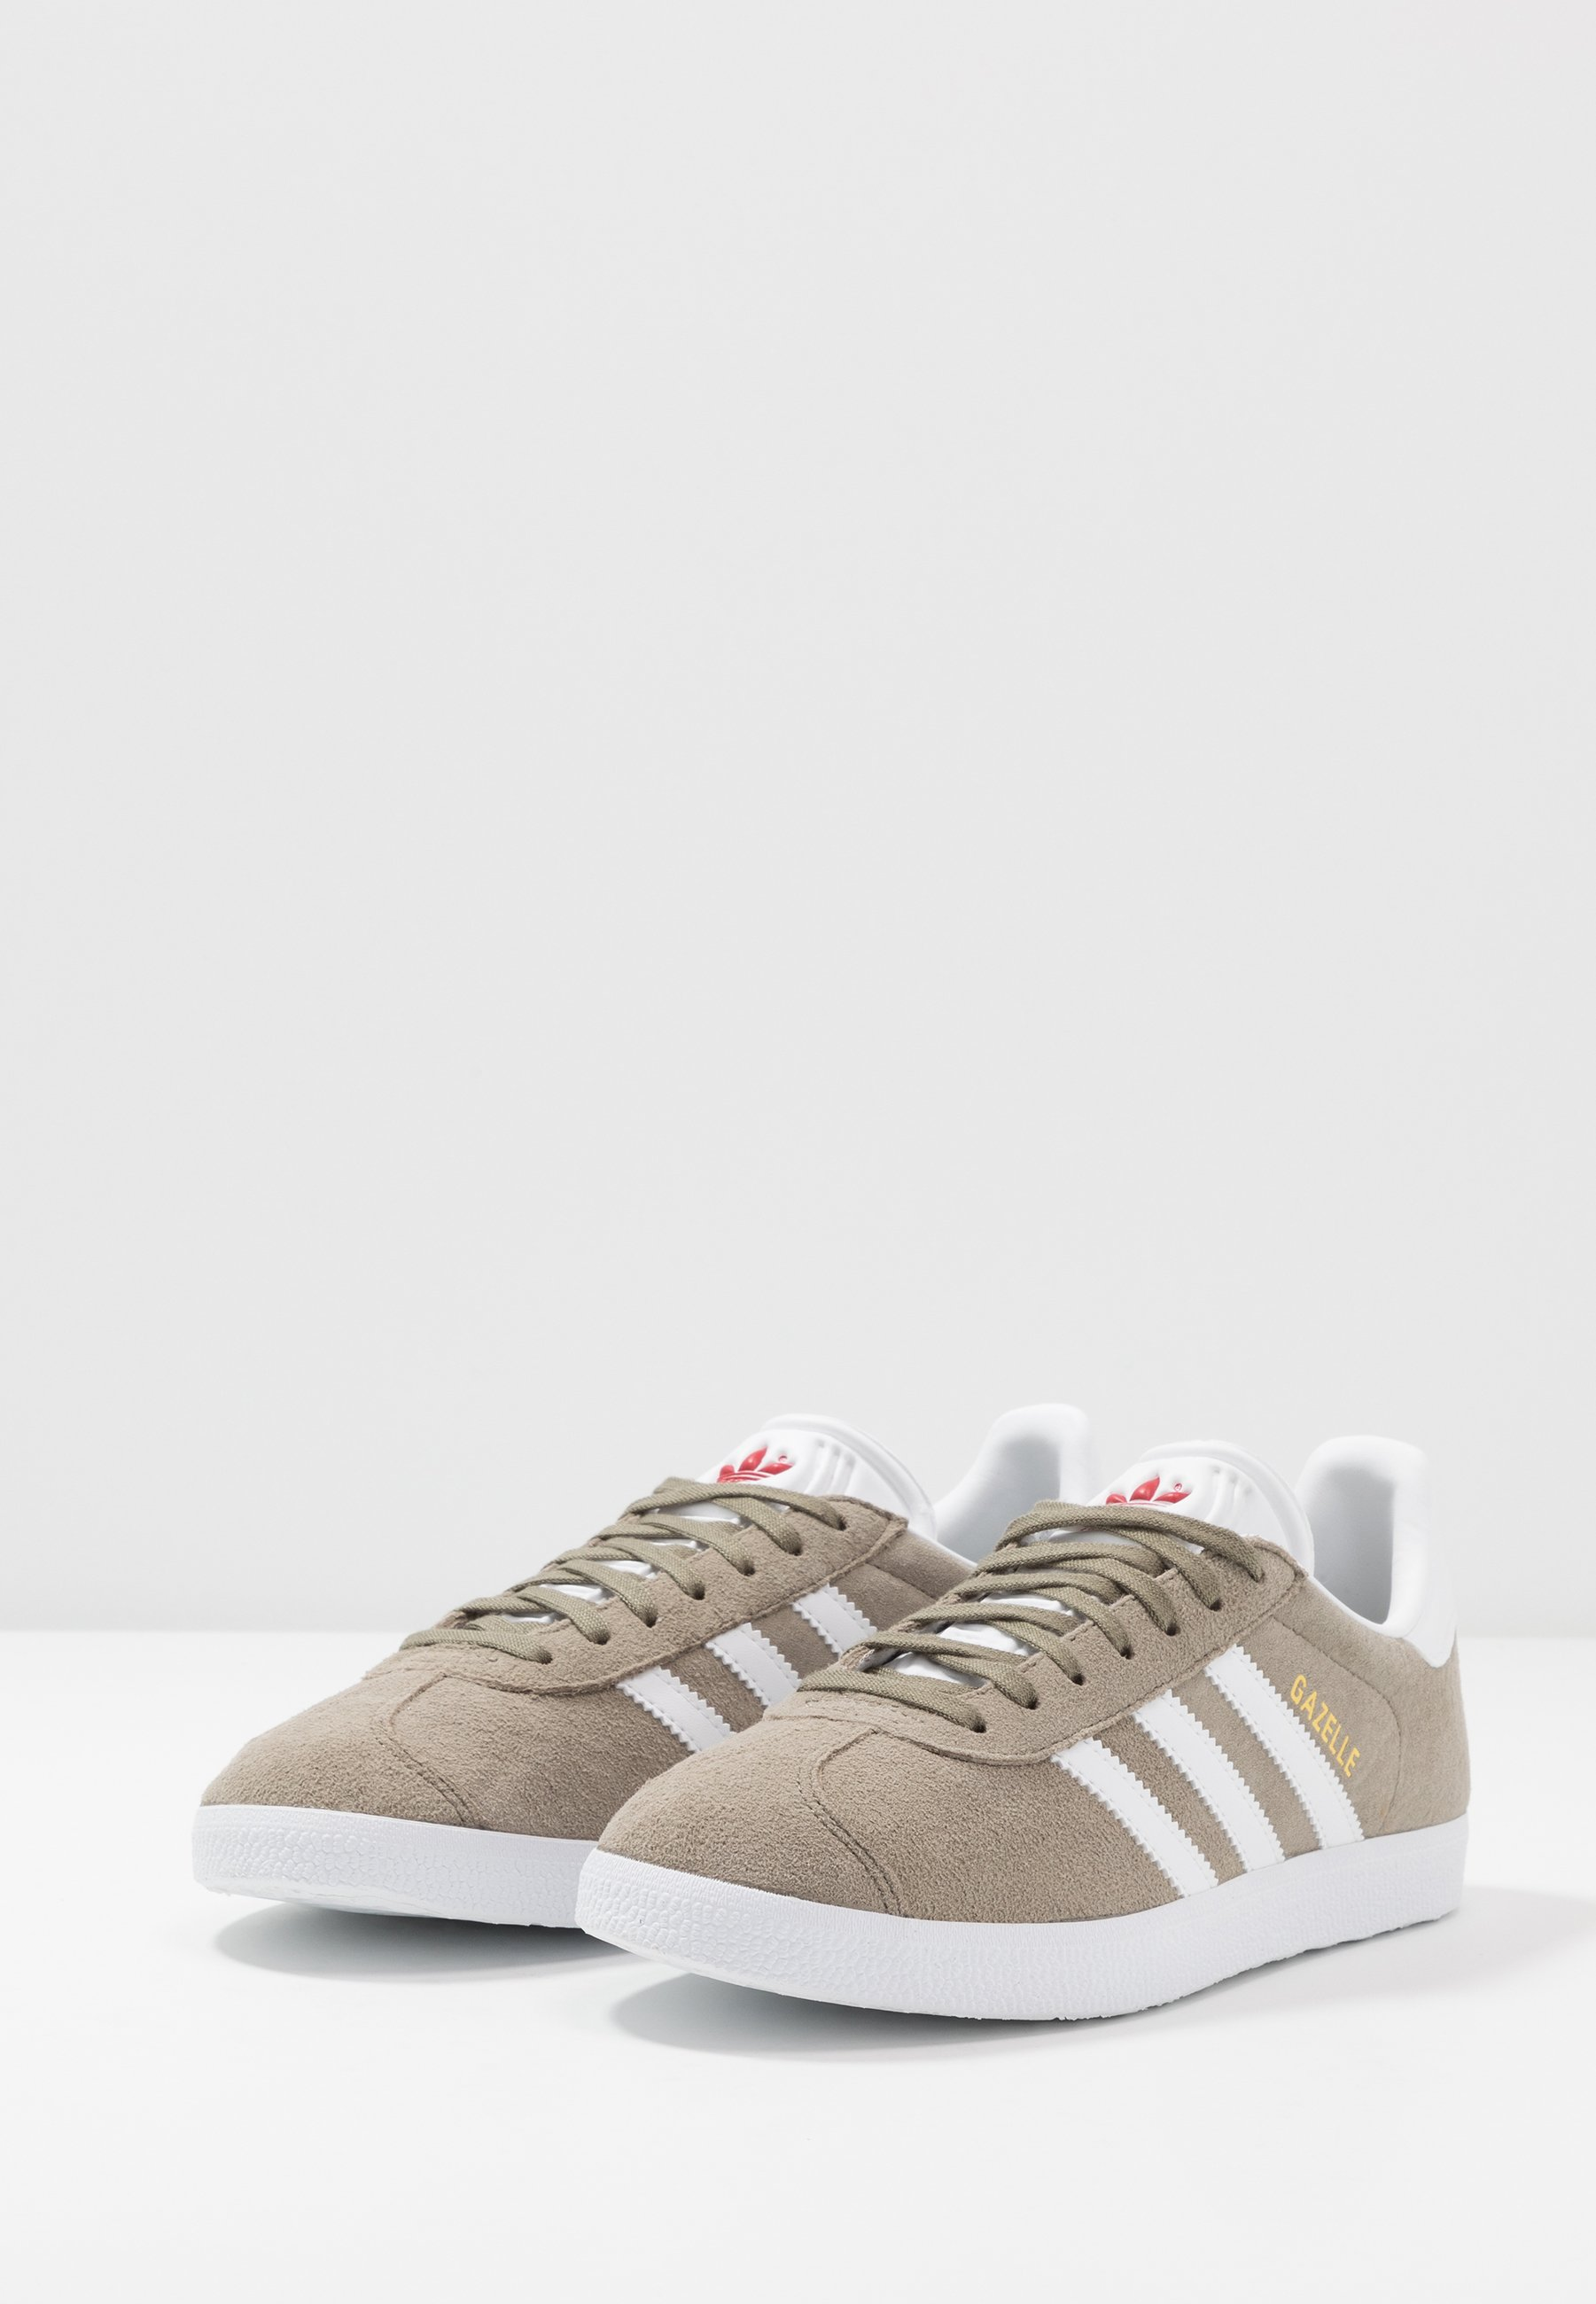 Adidas Originals Gazelle - Sneakers Basse Trace Cargo/footwear White/glow Red zGYesnD